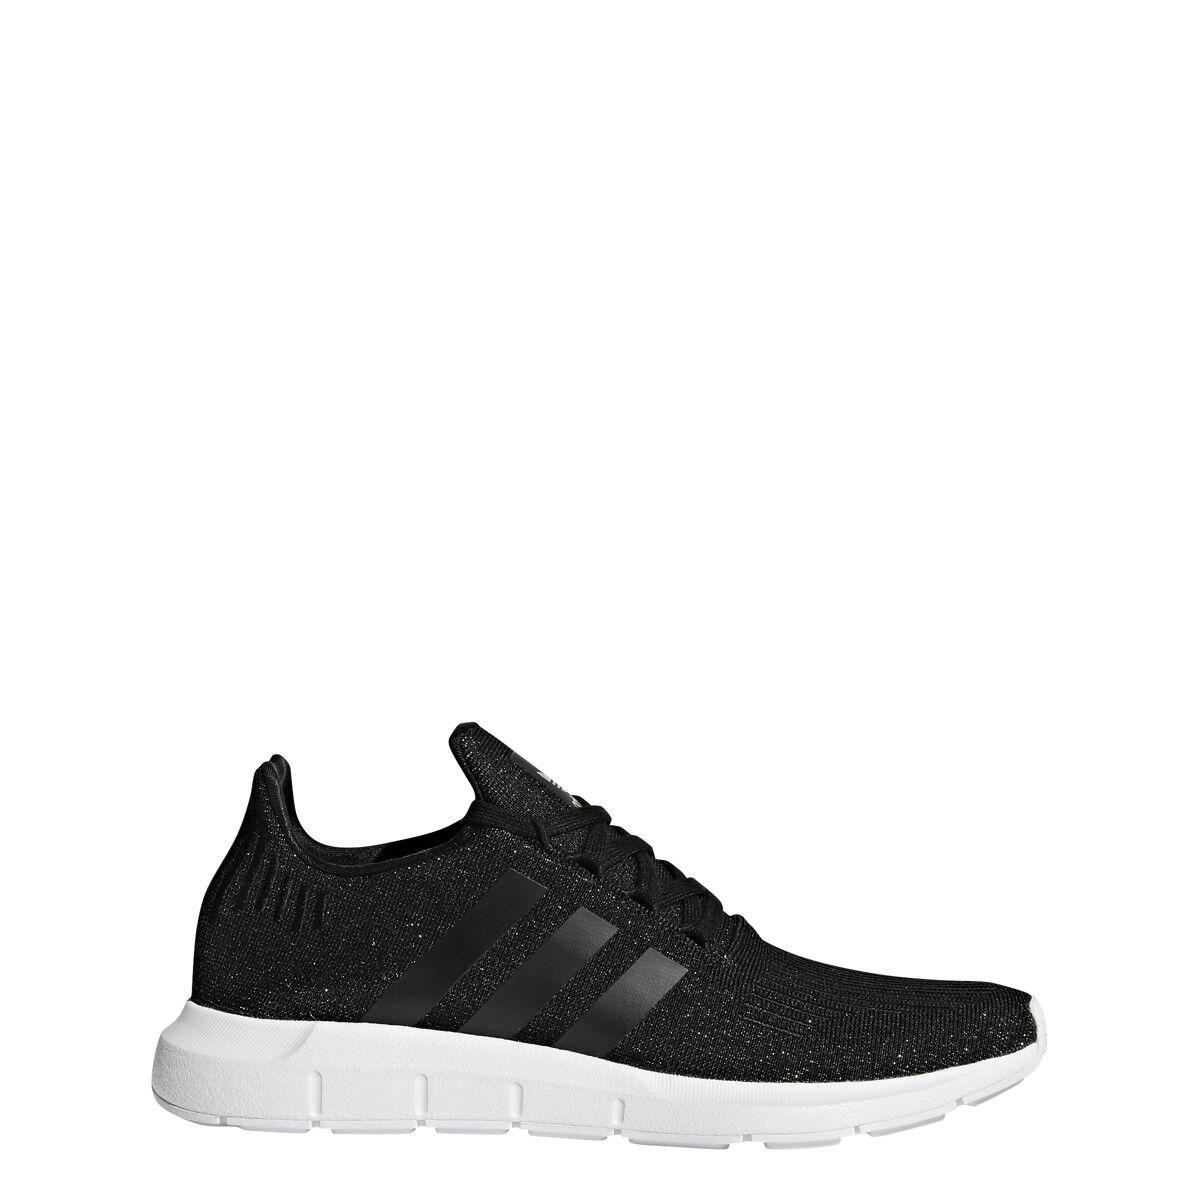 Adidas swift run di cq2018 cnero, cnero, bianco di run donne 8 c3382f